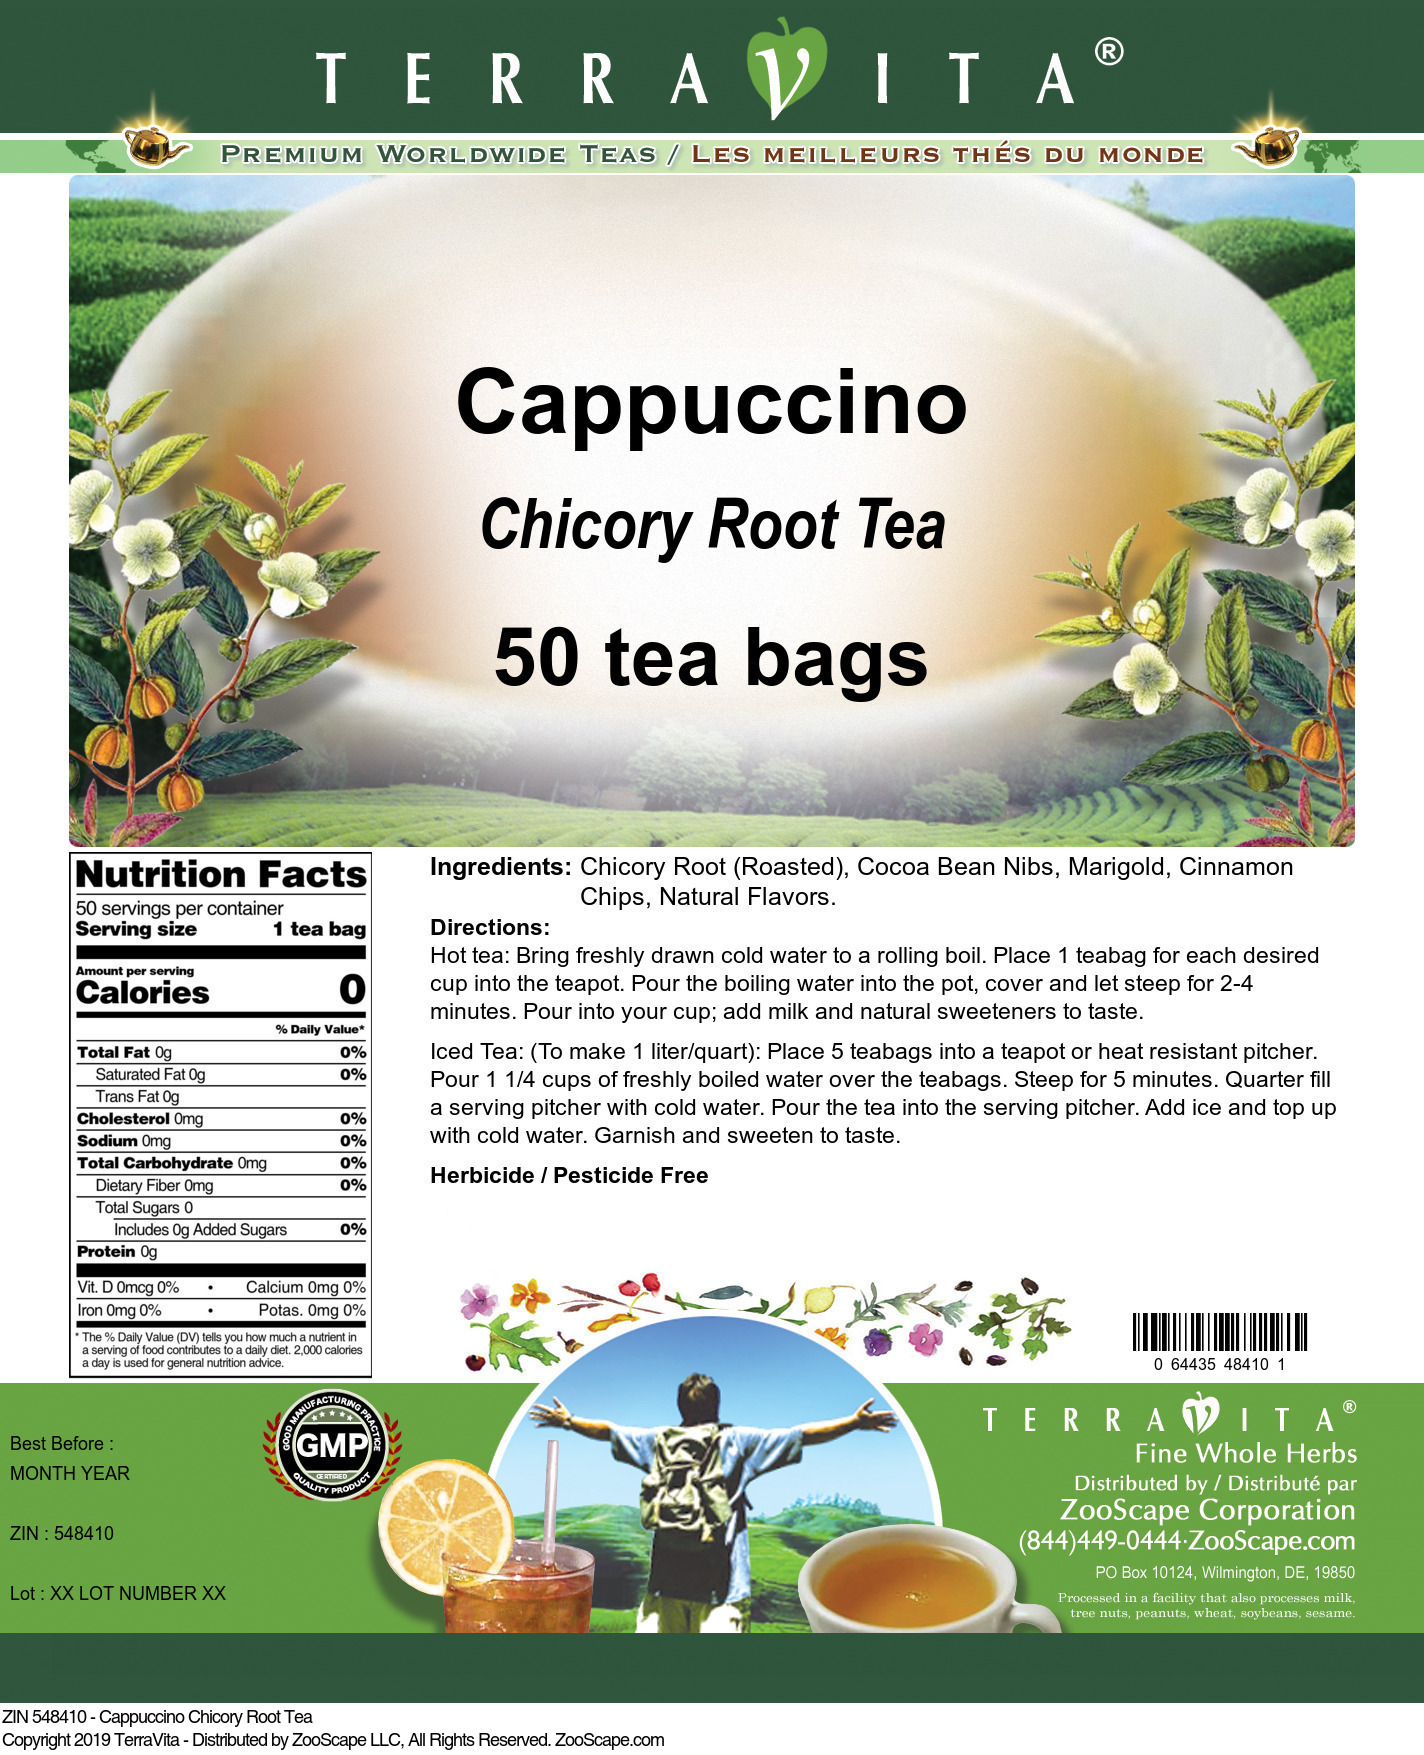 Cappuccino Chicory Root Tea